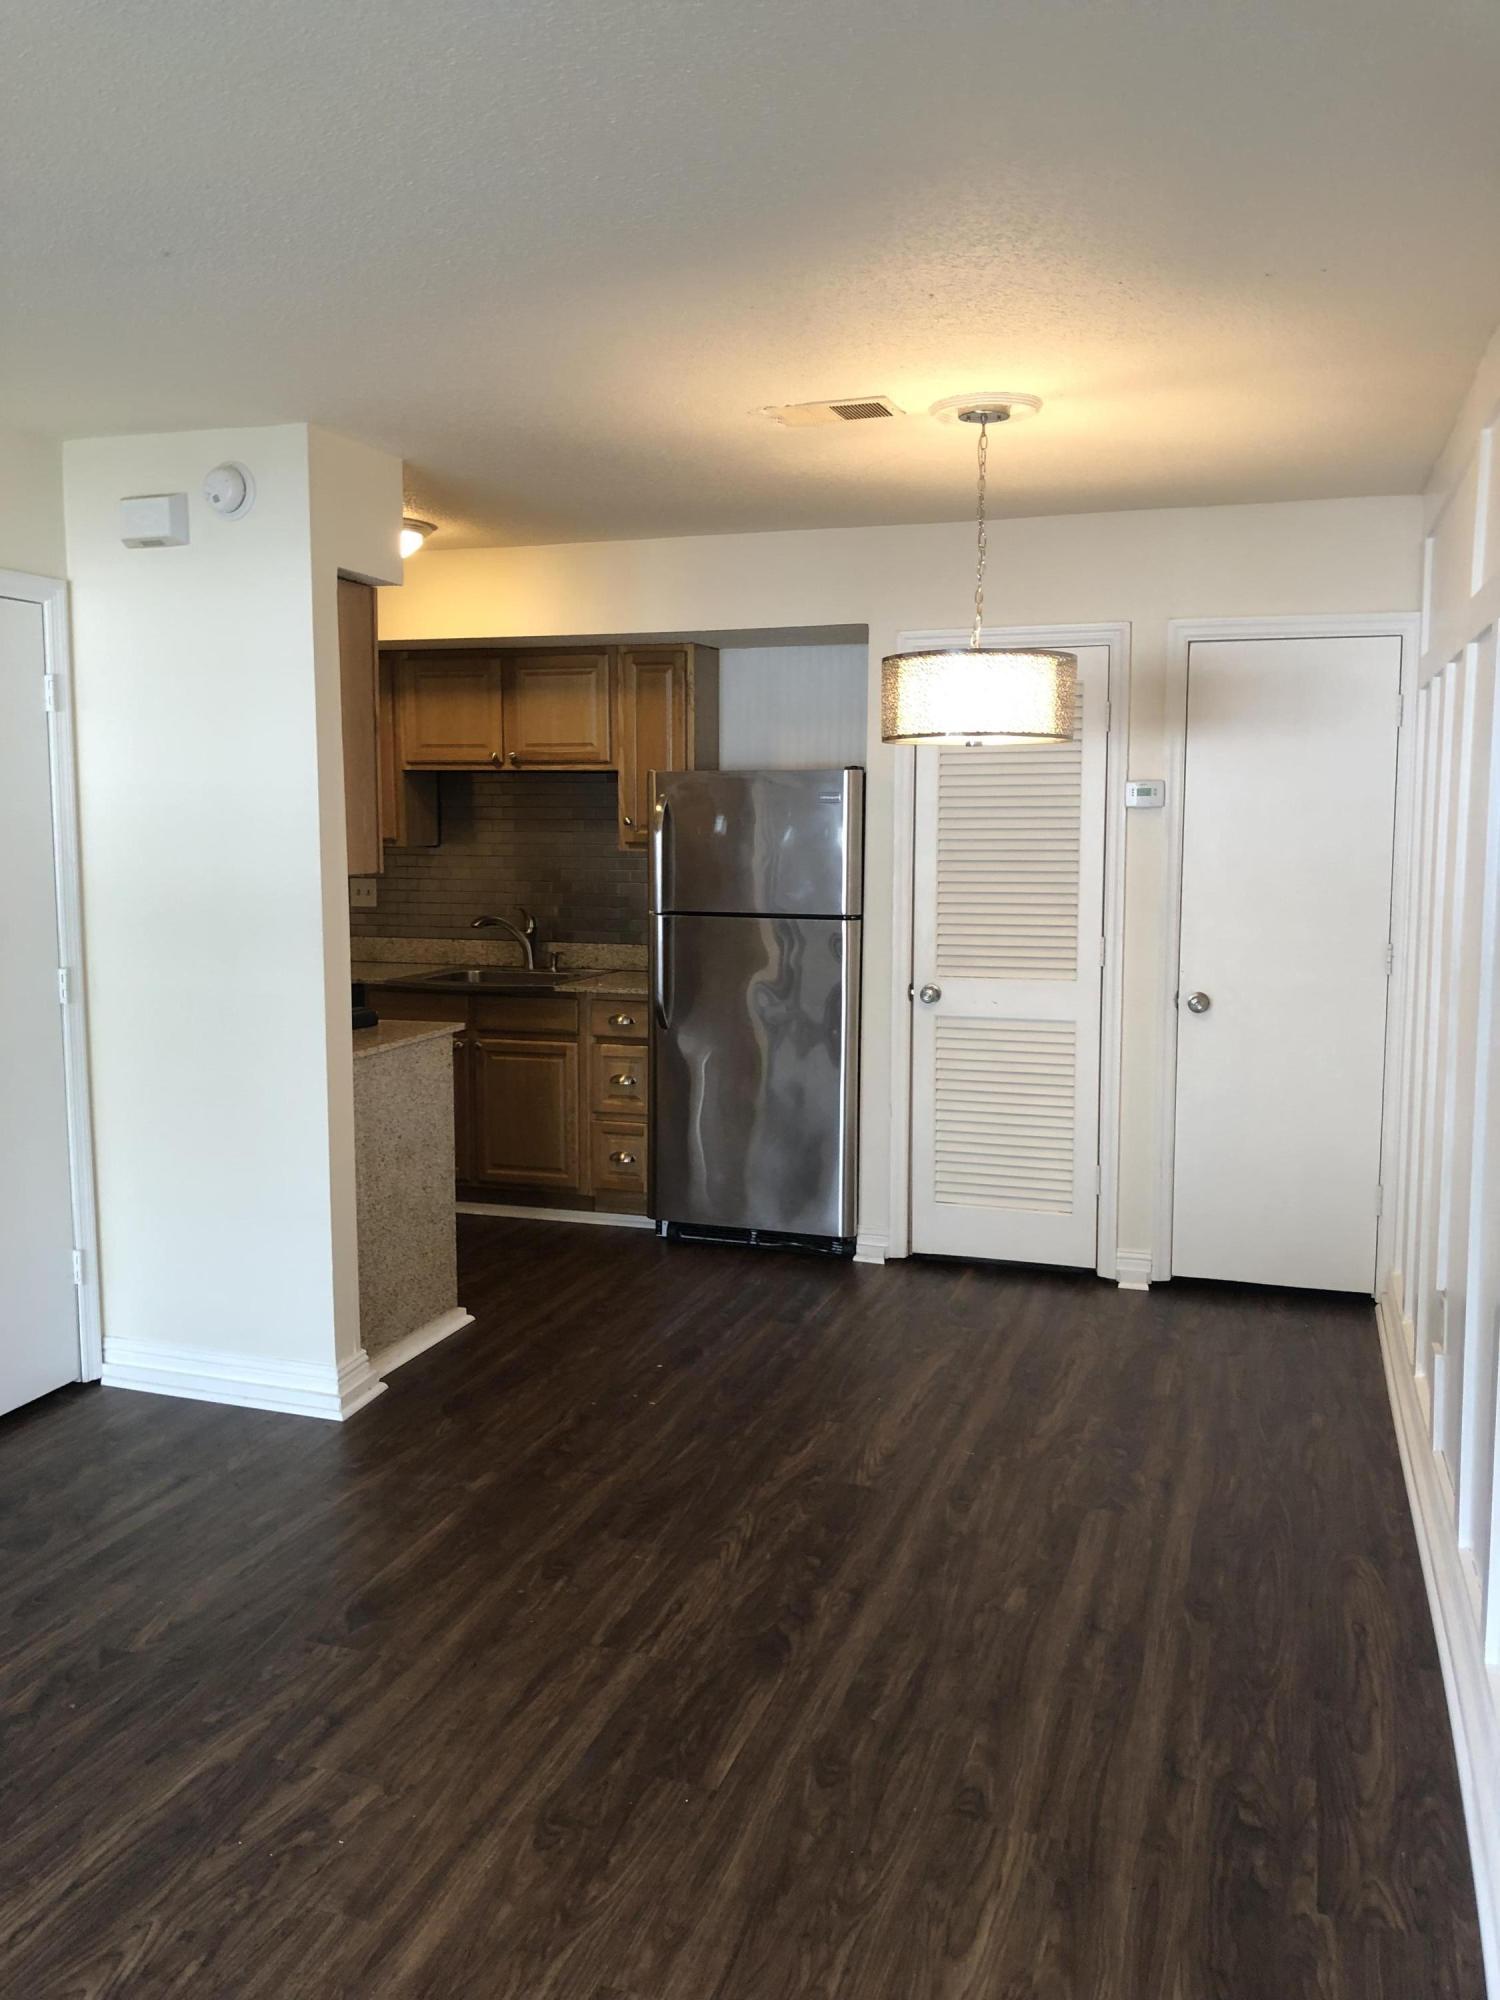 Melrose Park Townhomes Homes For Sale - 2494 Etiwan, Charleston, SC - 2